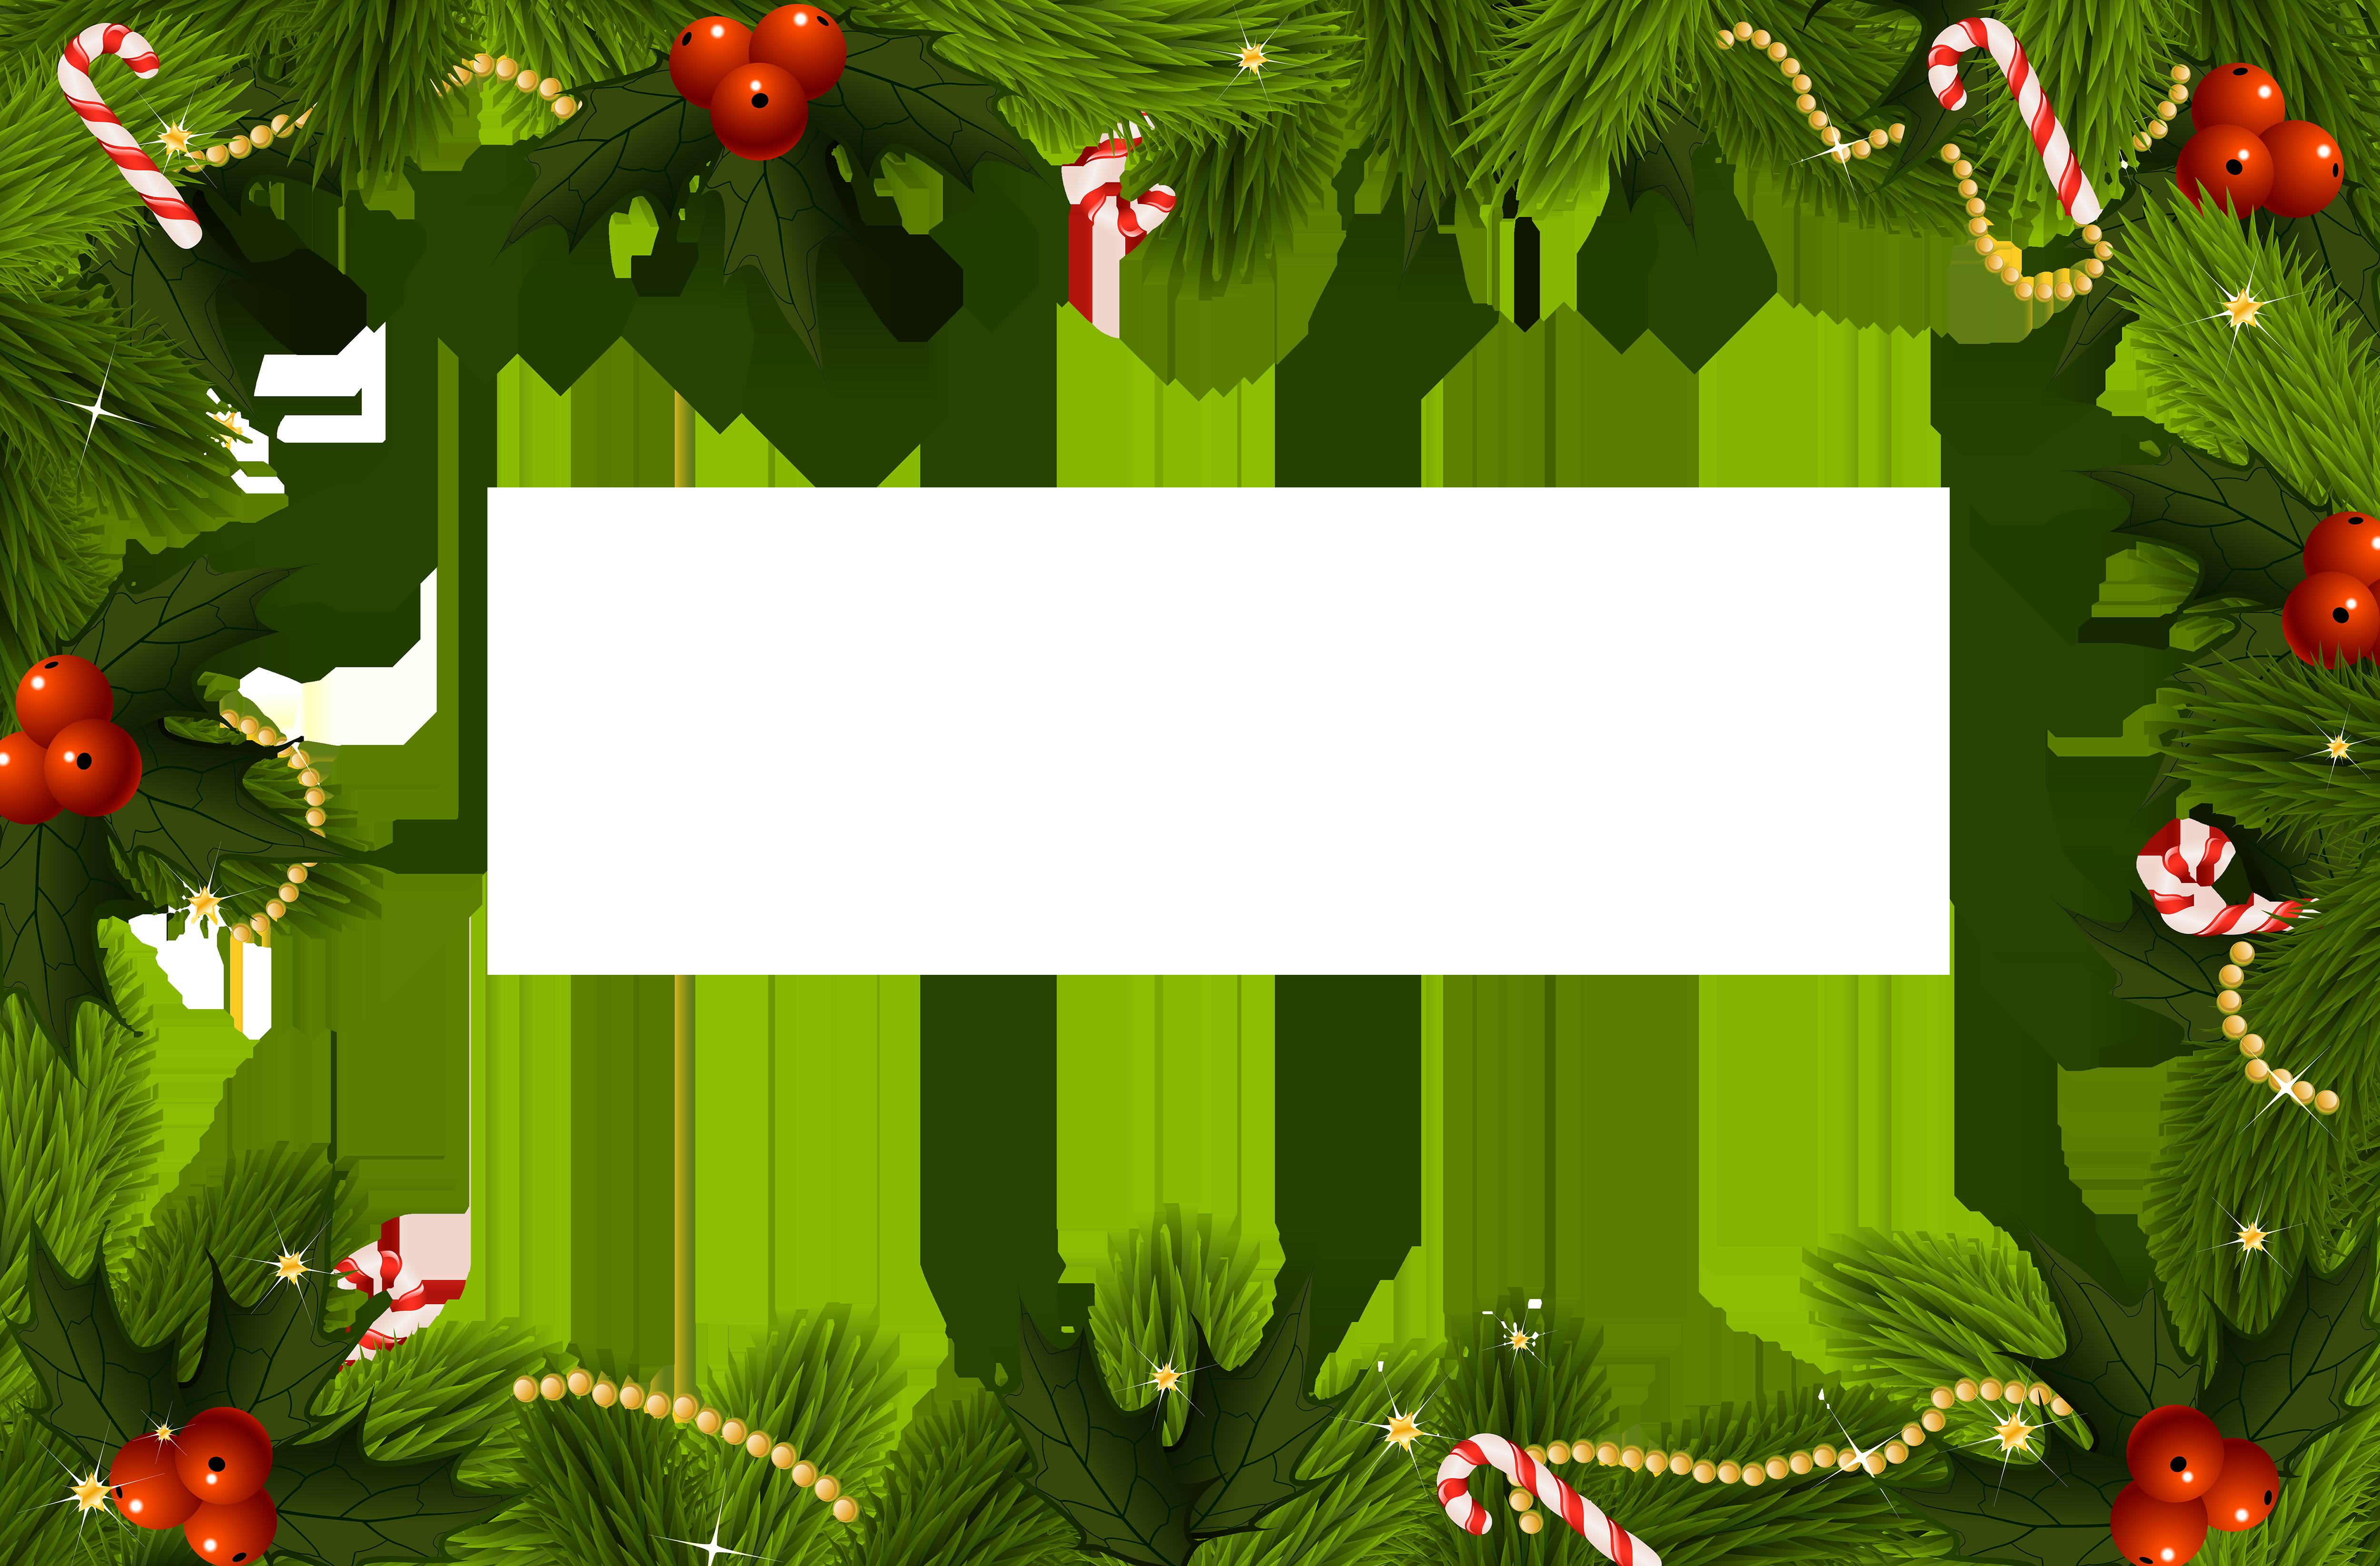 Christmas clipart frame clip art transparent Christmas Transparent PNG Border Frame | Gallery Yopriceville ... clip art transparent